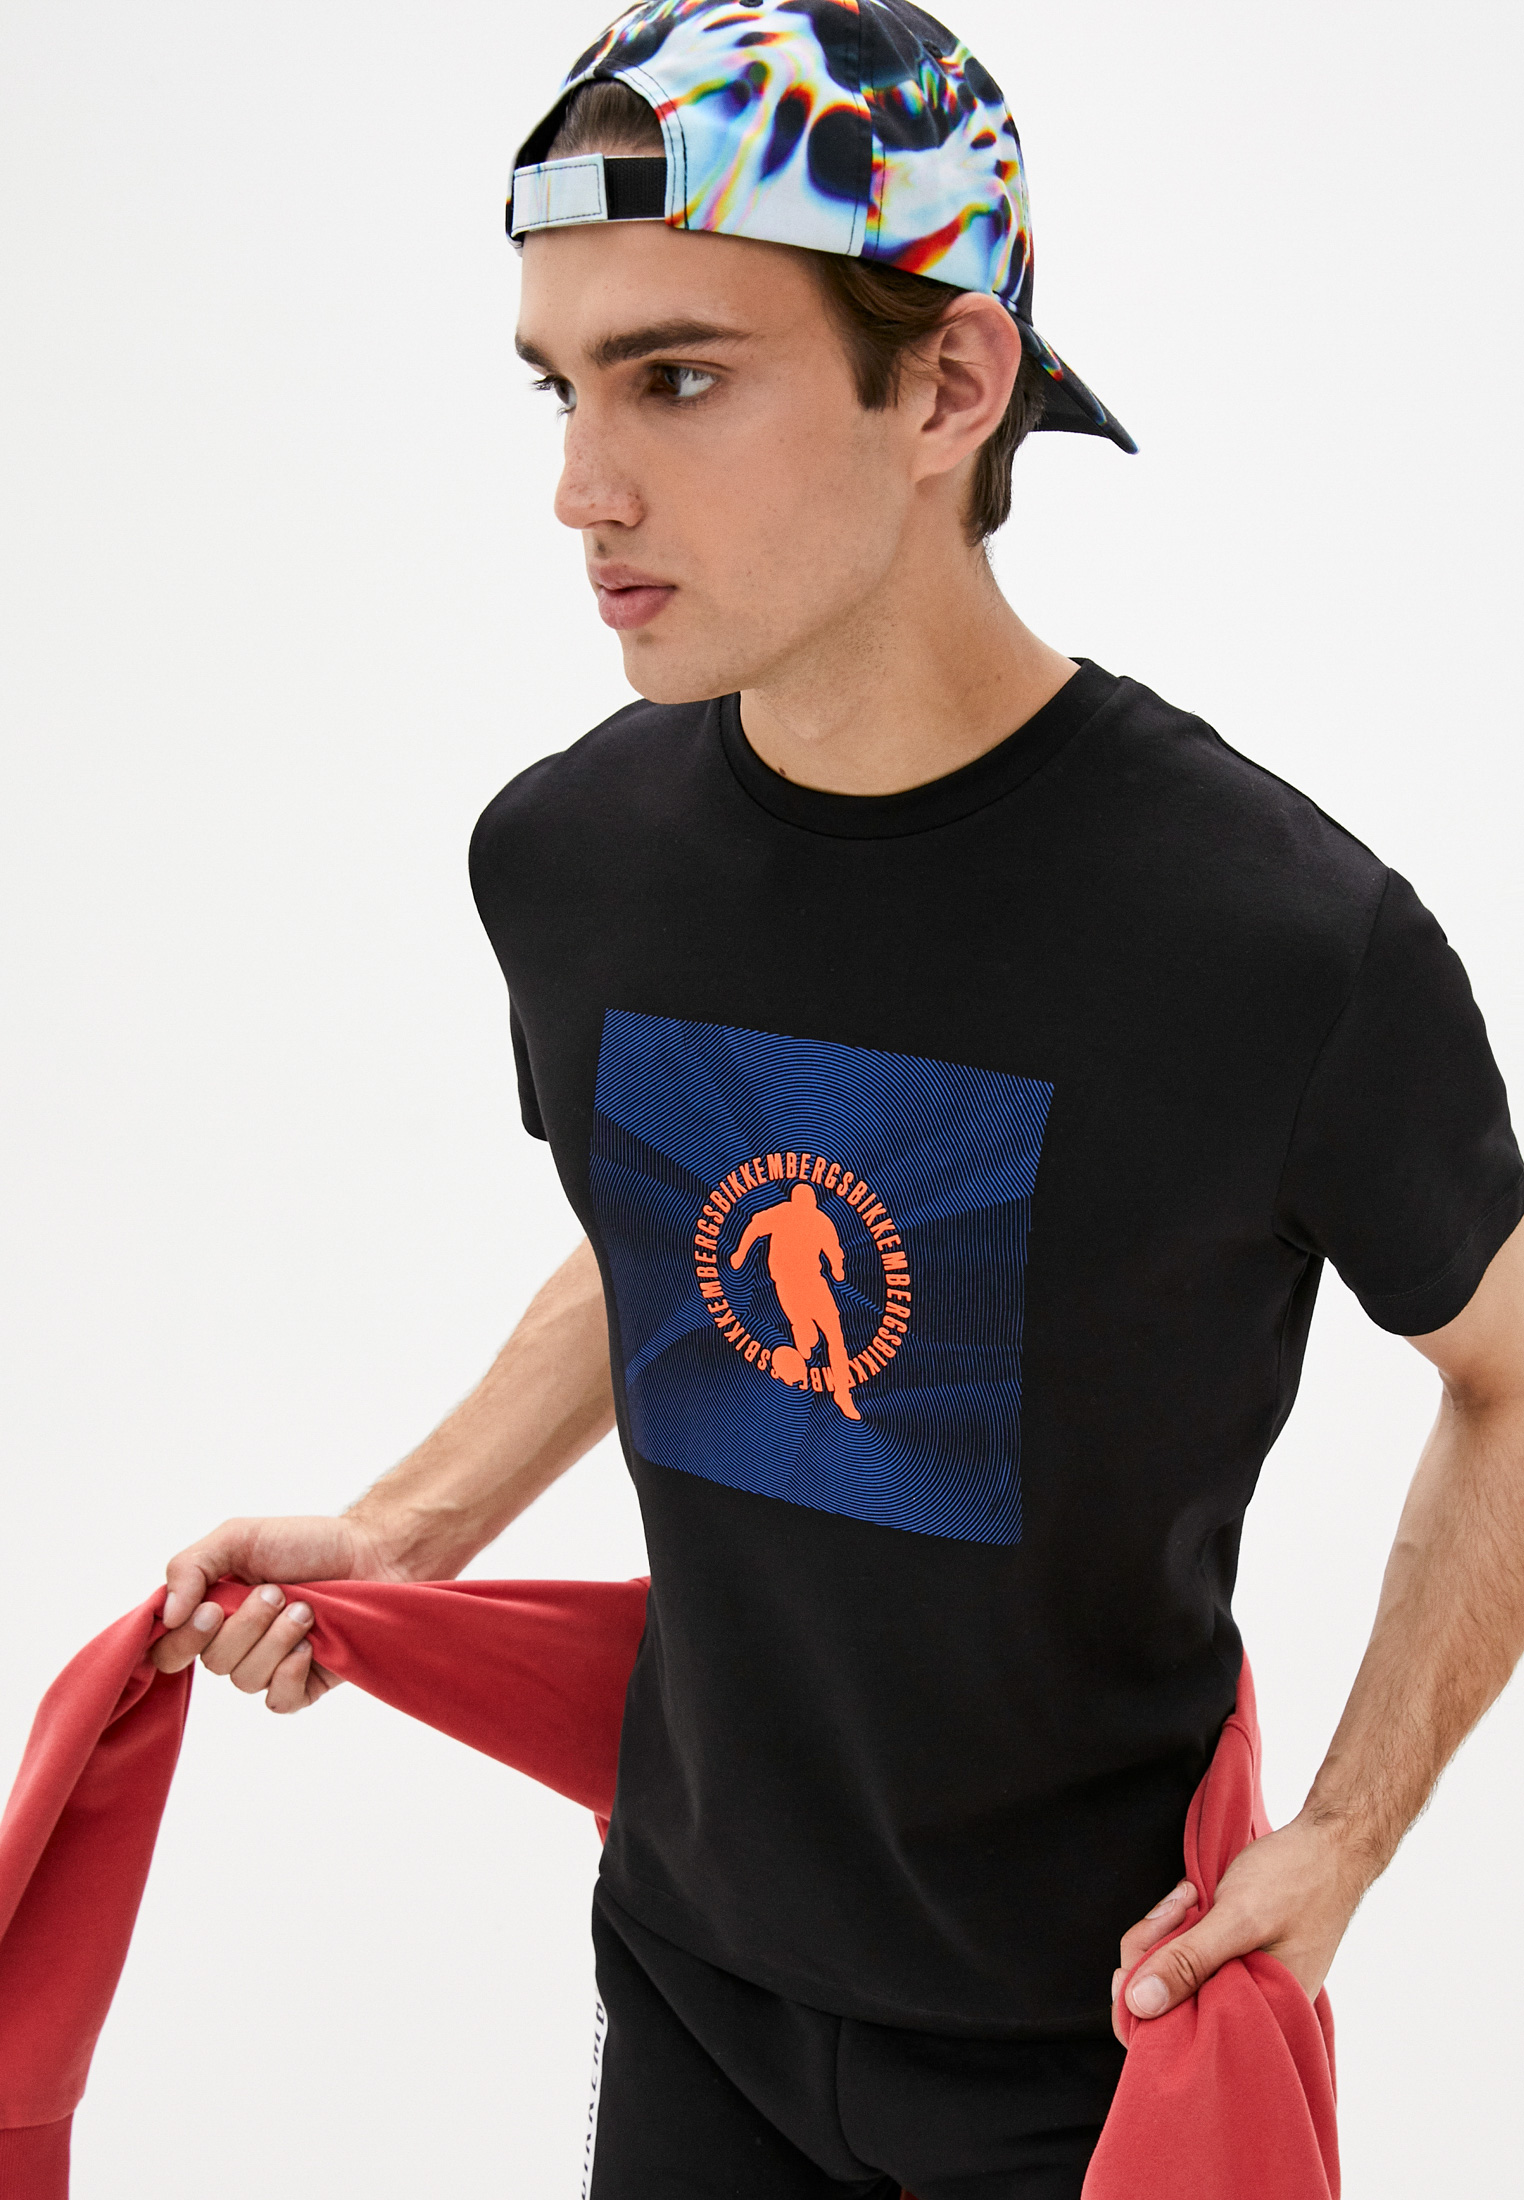 Мужская футболка Bikkembergs (Биккембергс) C 4 101 58 E 2298